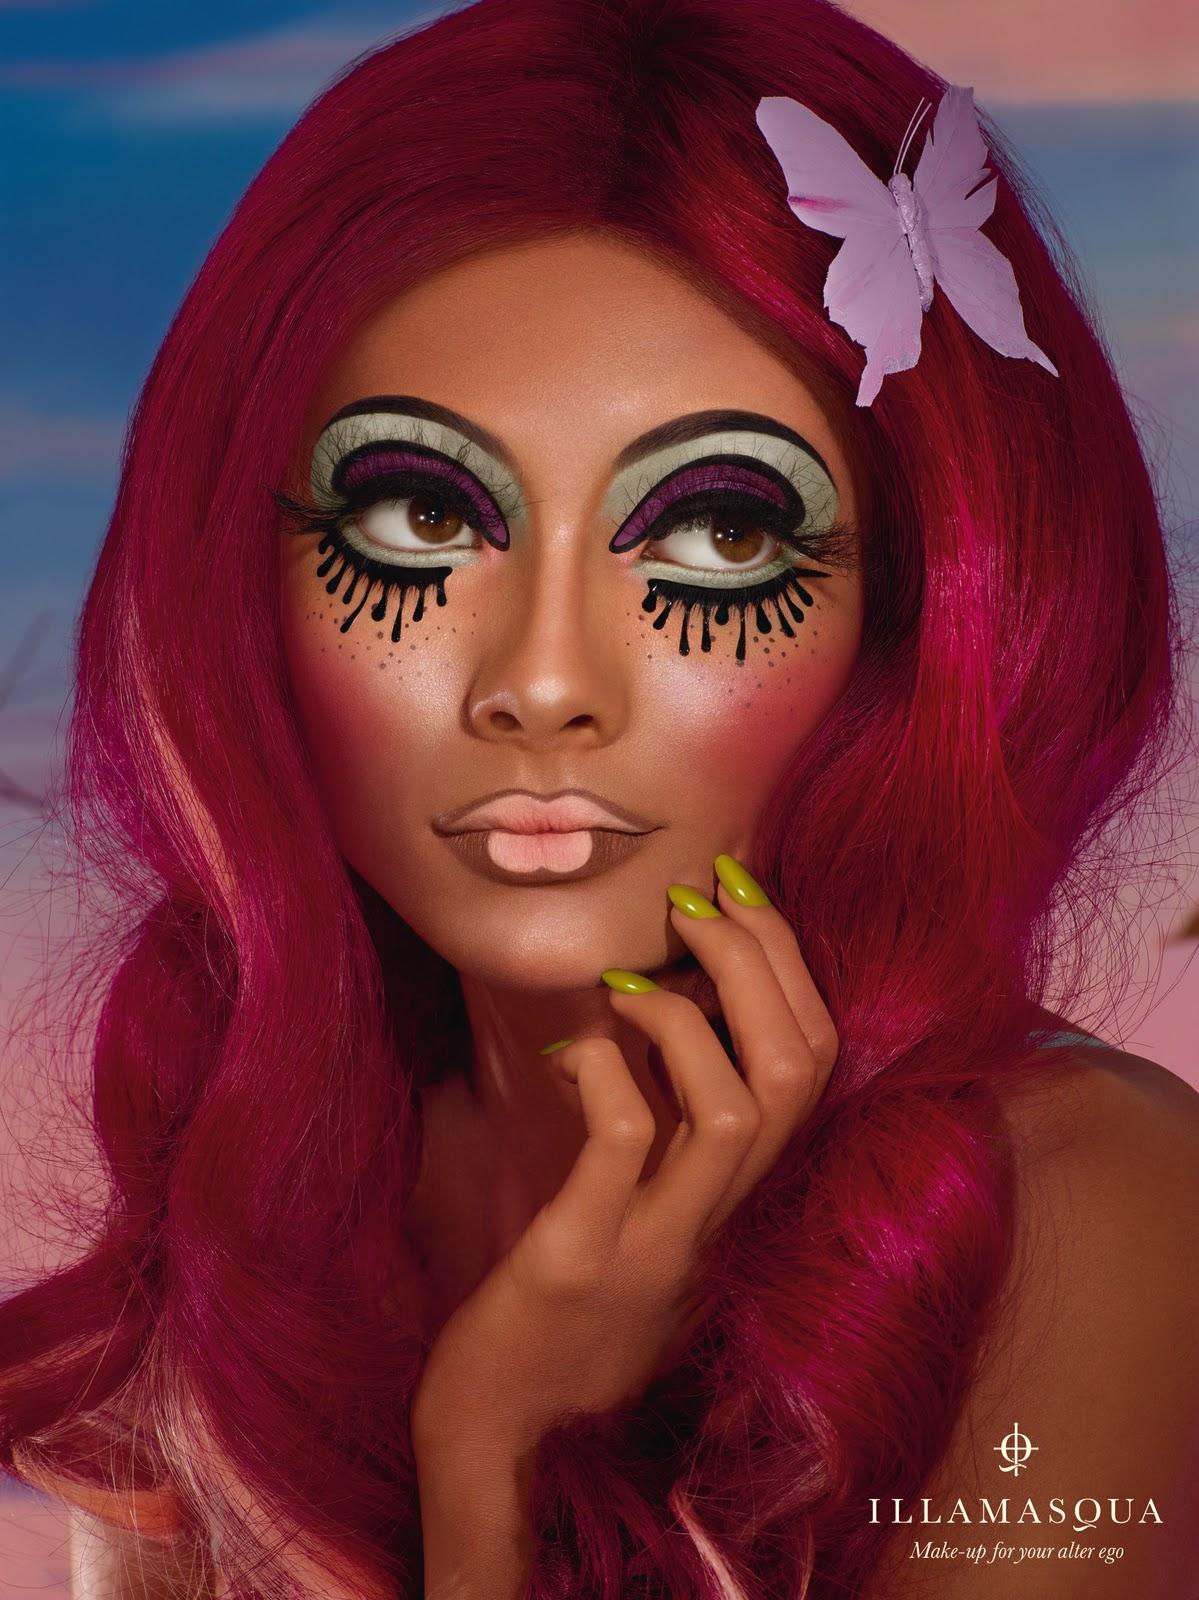 http://3.bp.blogspot.com/-IV4ZHwgUSTM/Tuoqh3UURqI/AAAAAAAAFXo/zgfi31S6vy8/s1600/Pink+wig_face.jpg